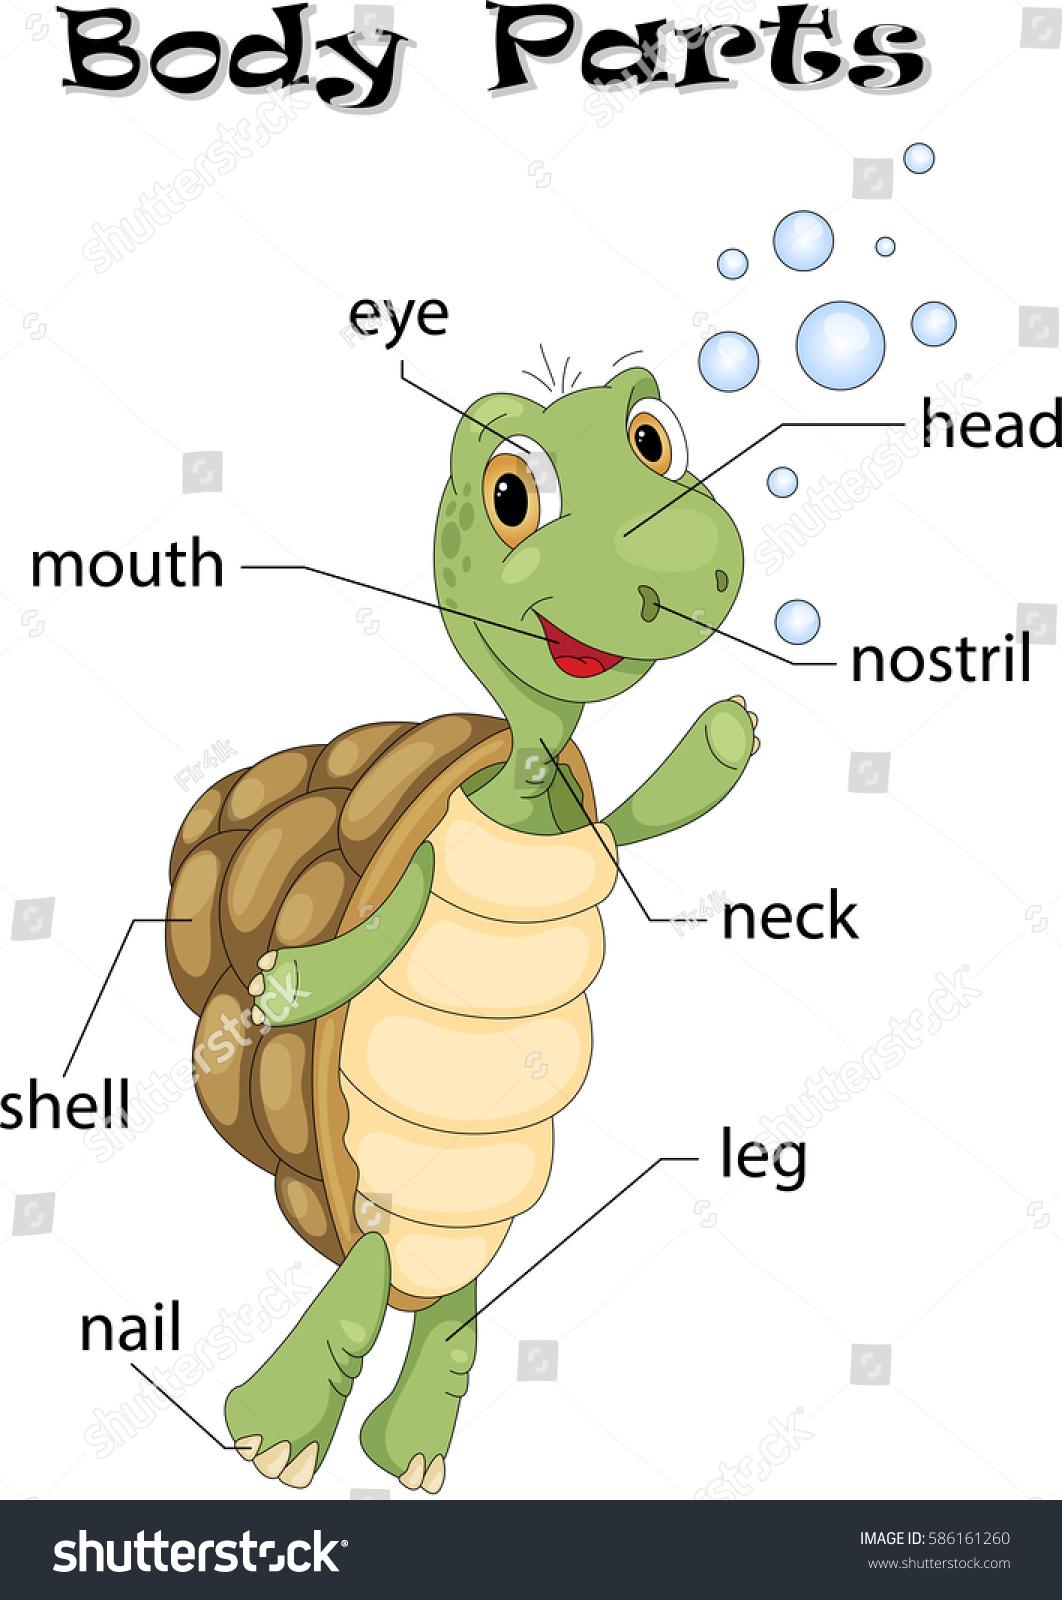 Turtle Body Parts Animal Anatomy English Stock Vector